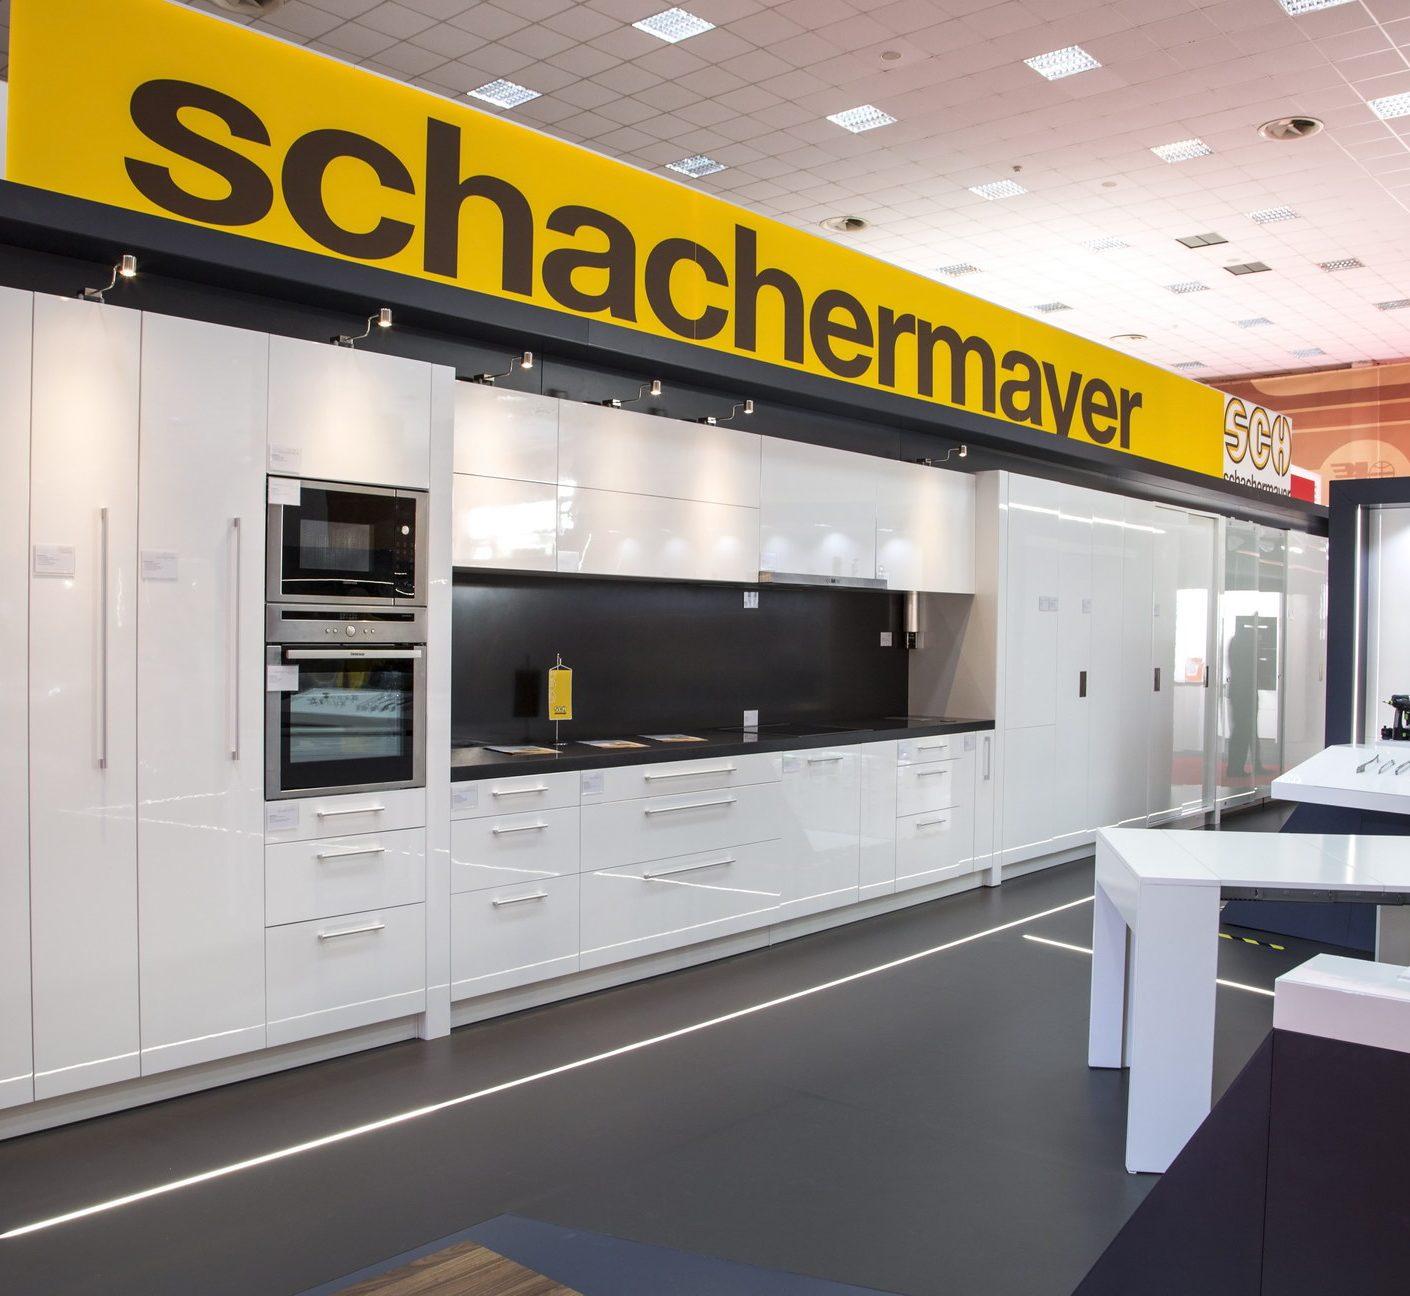 stand-expo-mobila-Schachermayer-trivenus-hcd-11